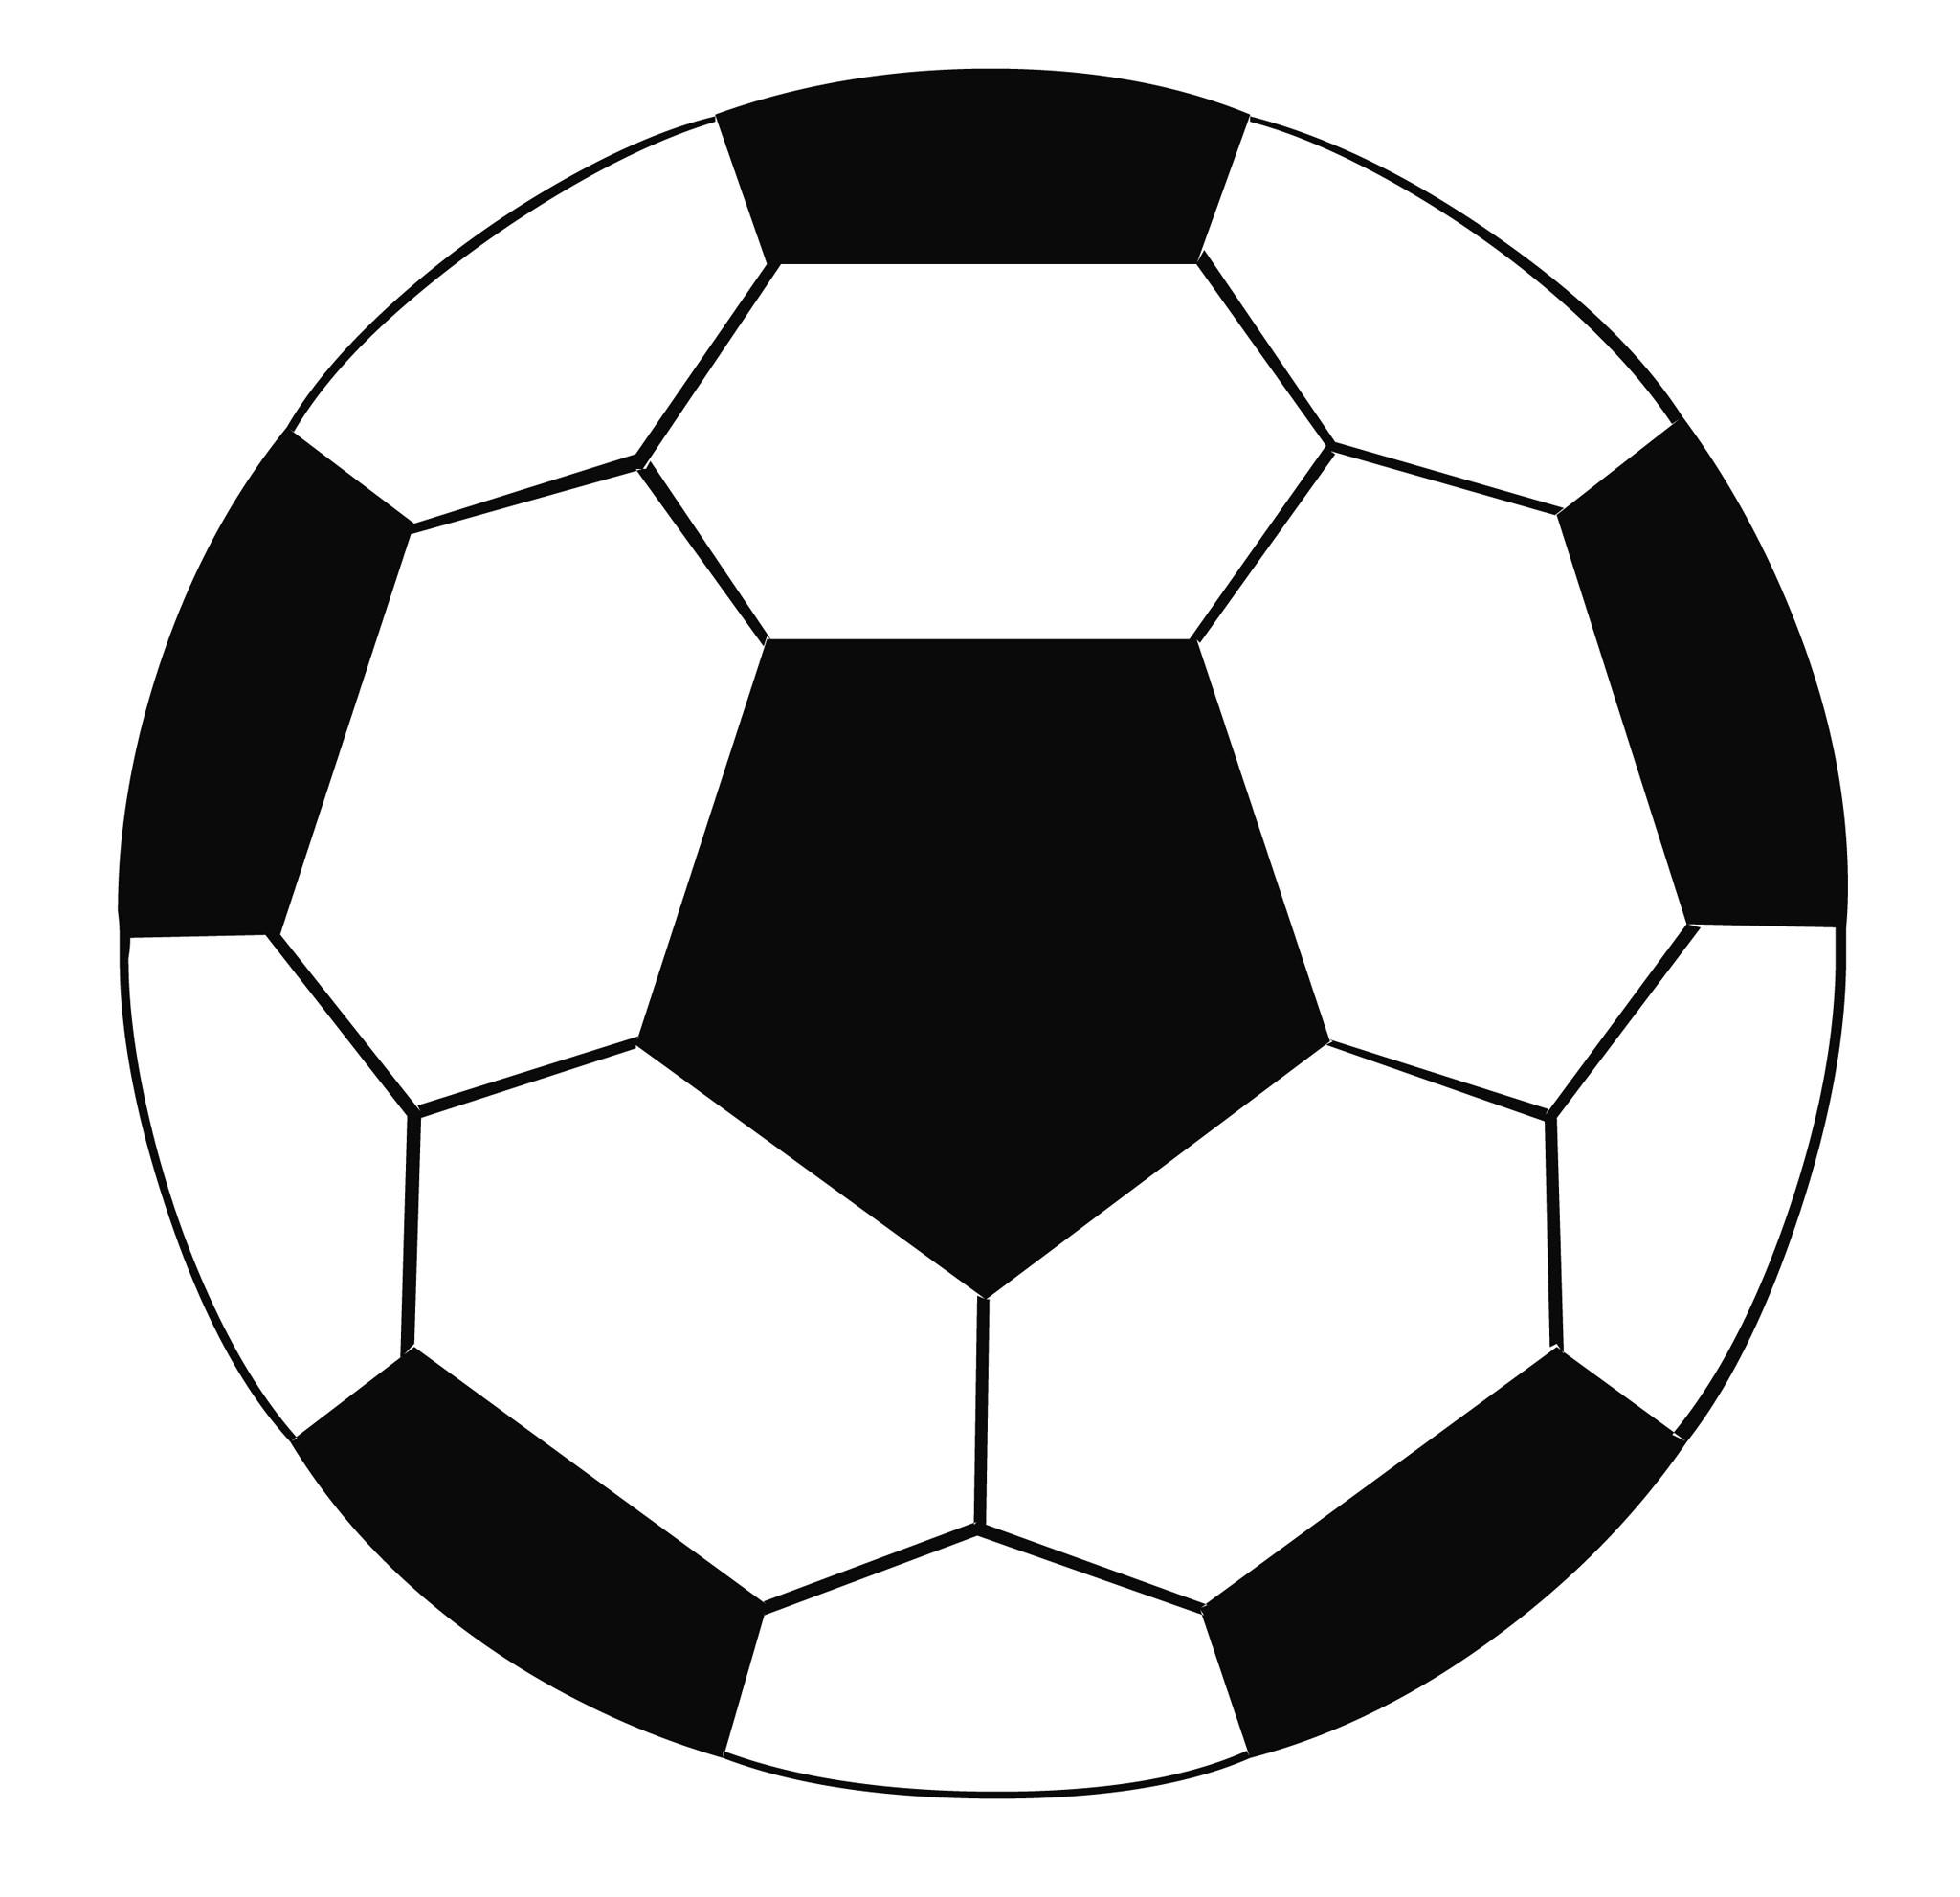 ... clip art soccer ball; Free ...-... clip art soccer ball; Free ...-5